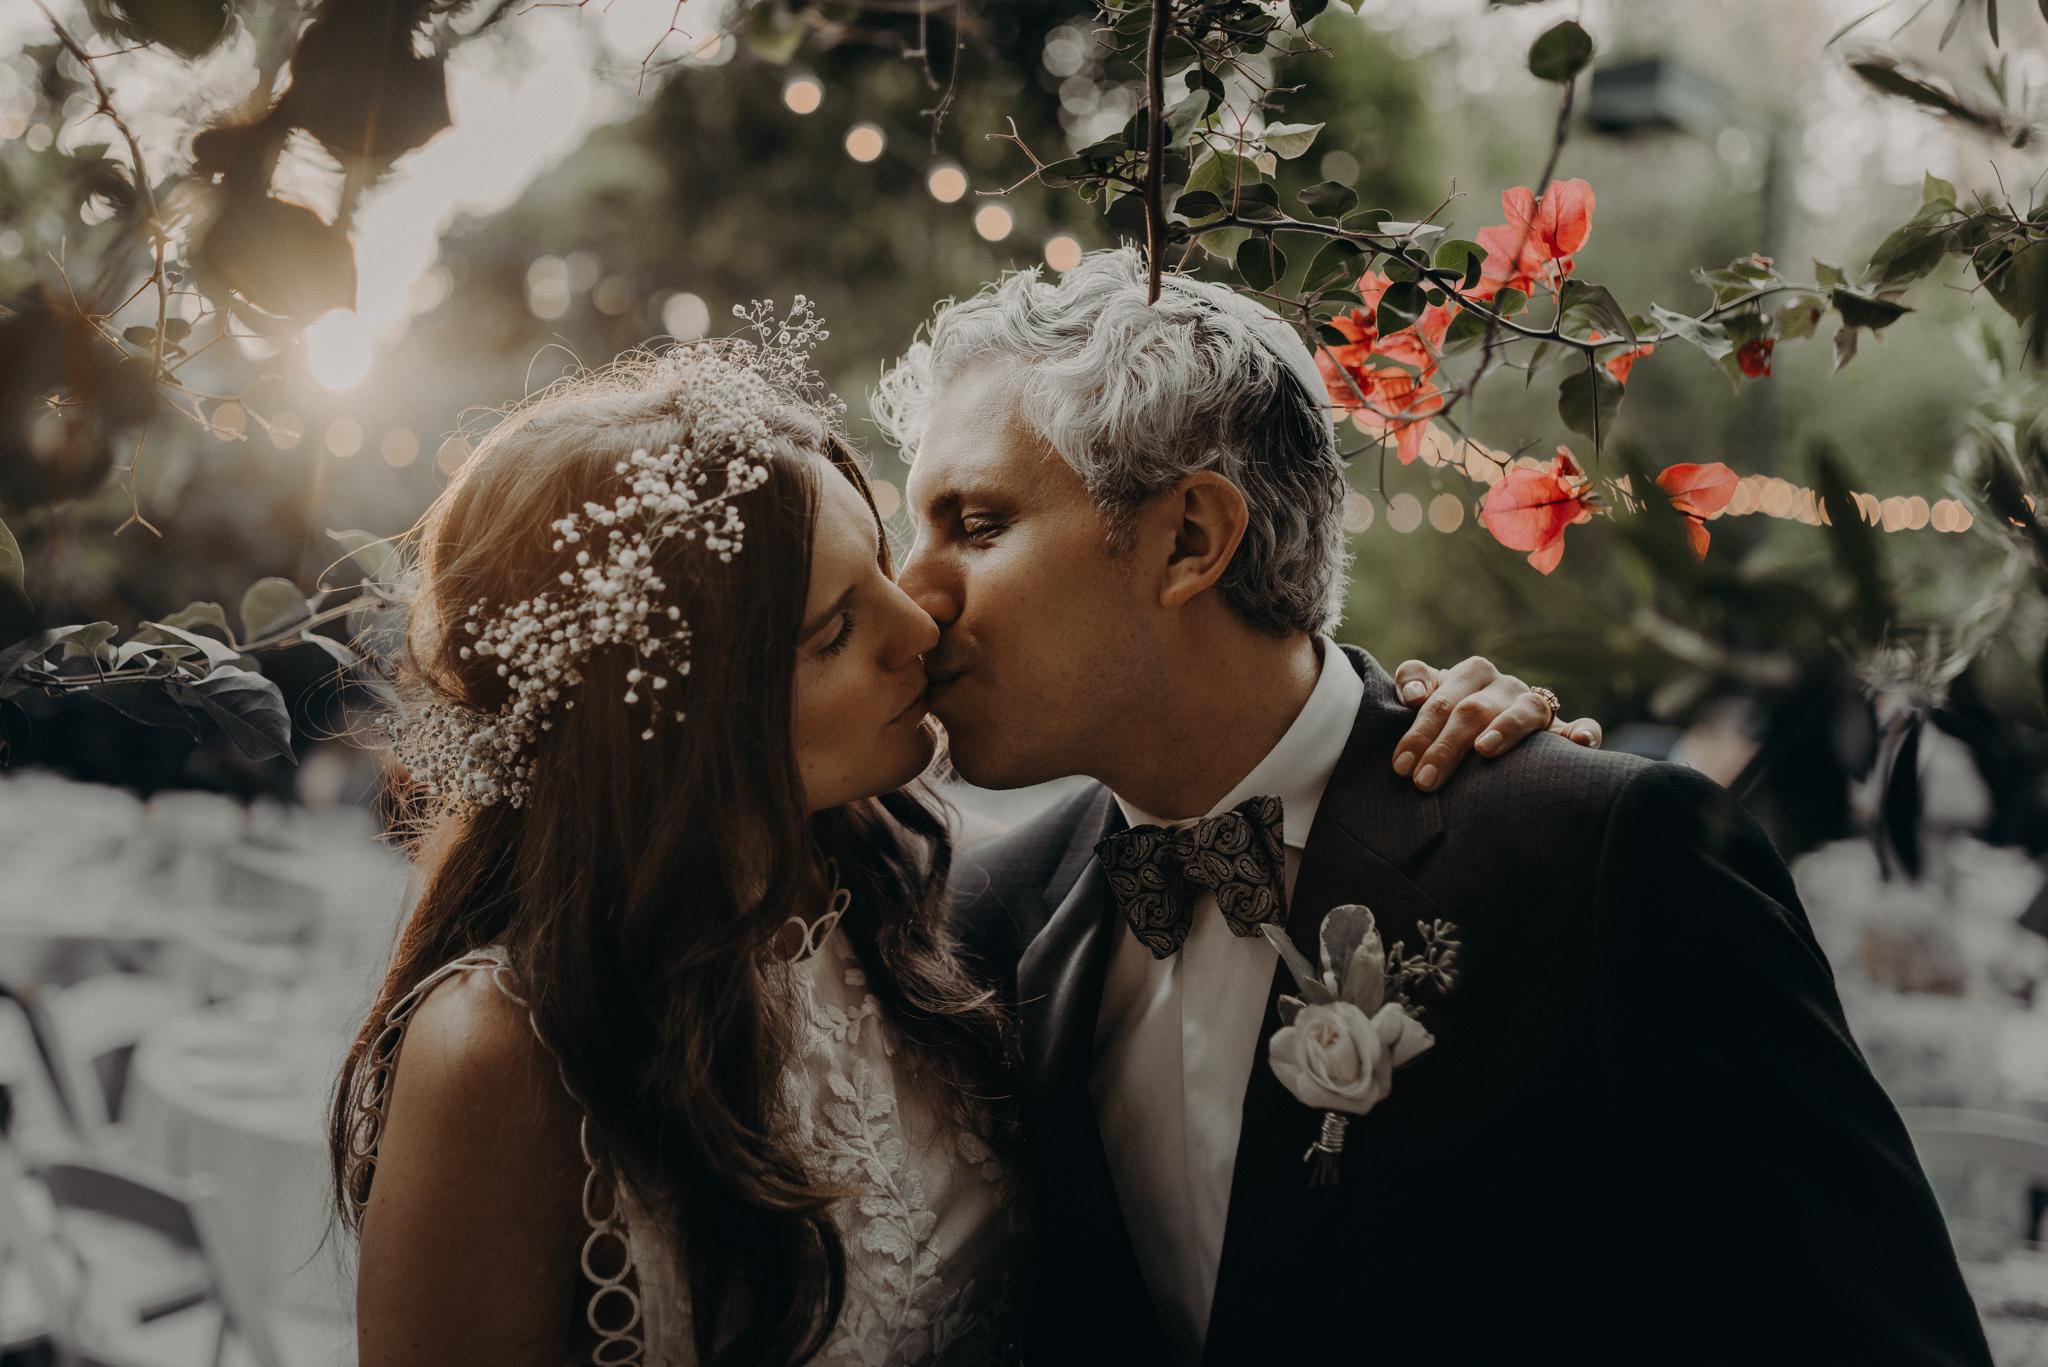 Isaiah + Taylor Photography - Private Estate Backyard Wedding - Beverly Hills - Los Angeles Wedding Photographer - 88.jpg